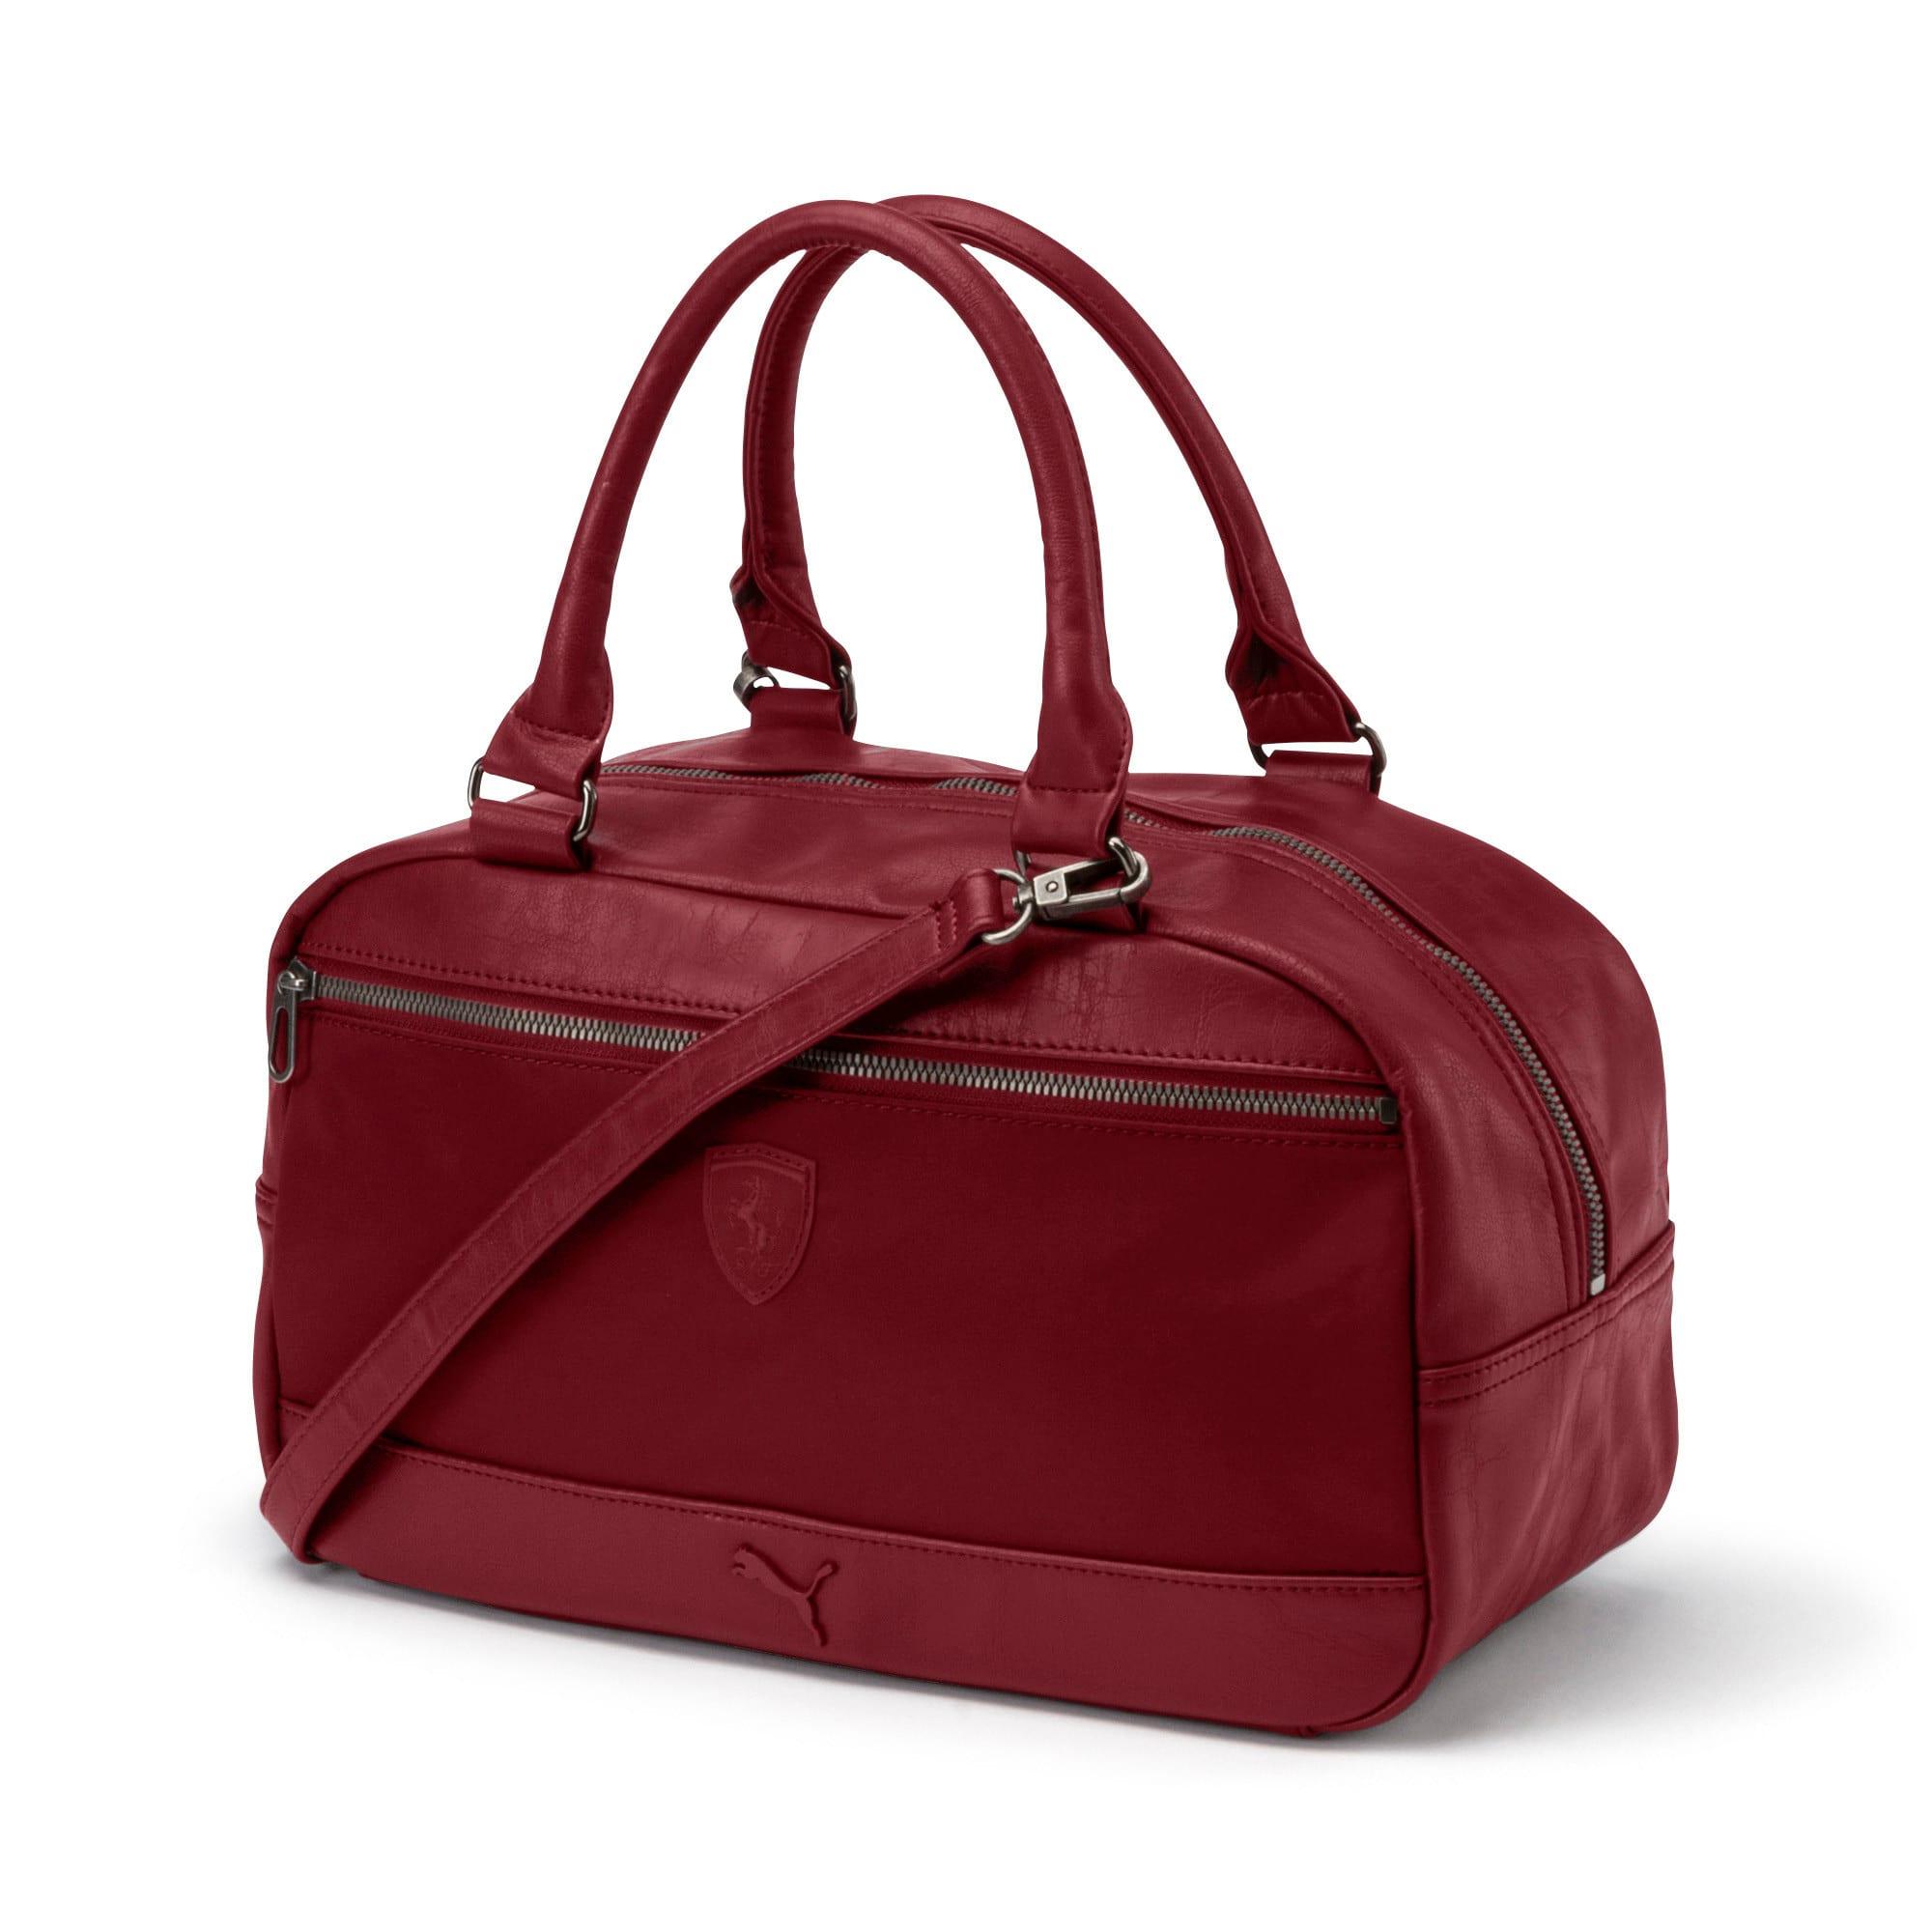 Thumbnail 1 of SF LS Handbag Puma Black, Pomegranate, medium-IND